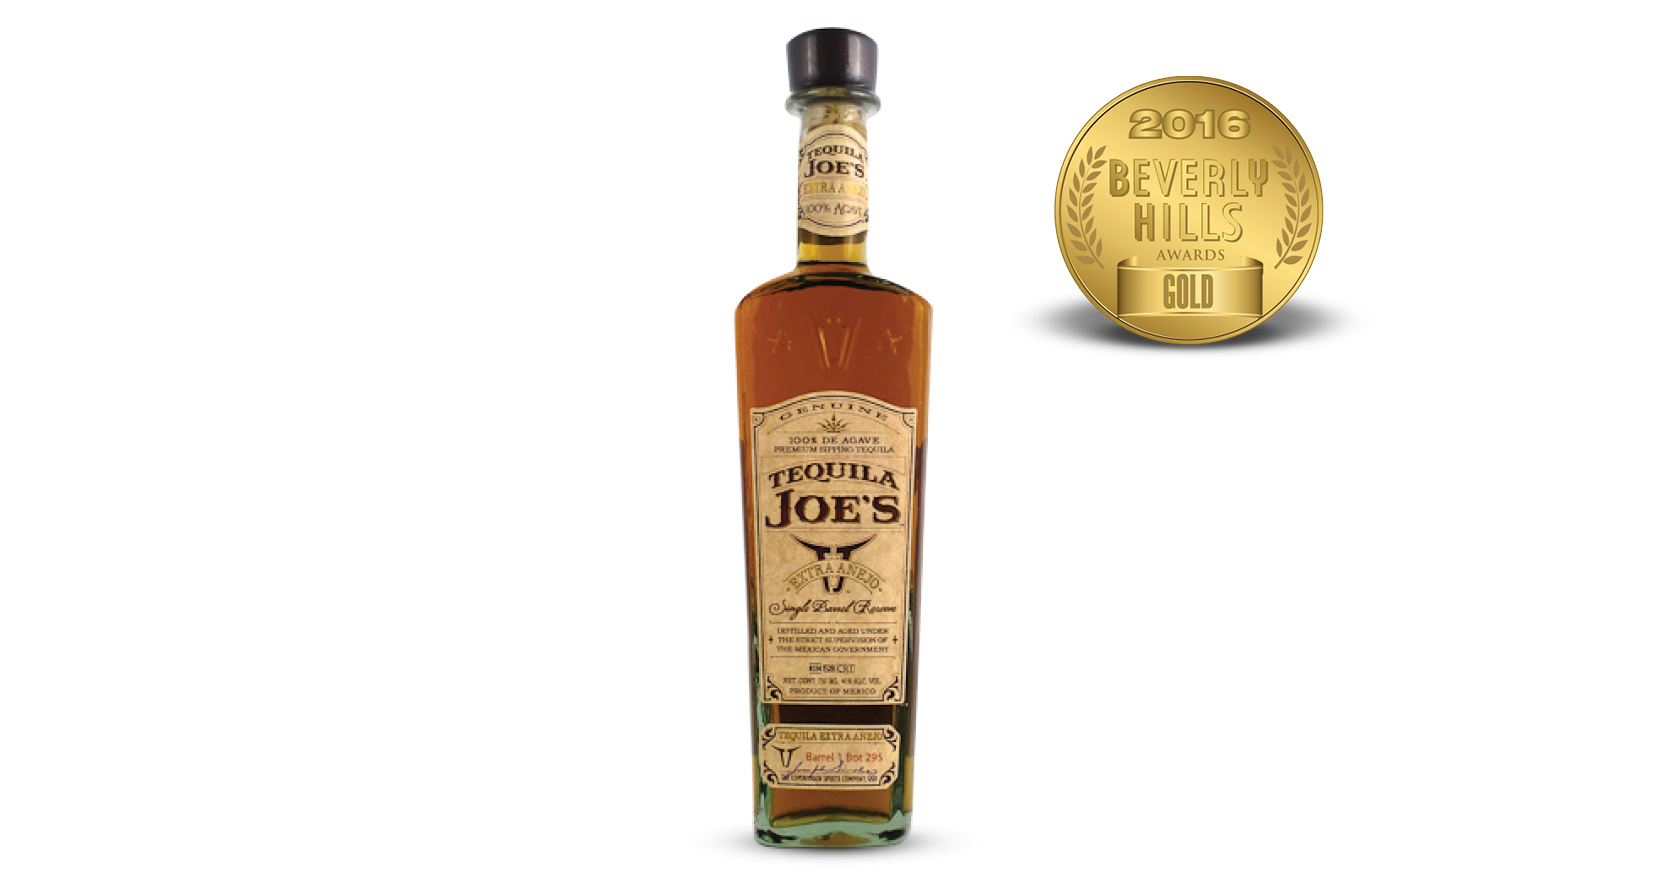 Tequila Joe's Extra Añejo Tequila